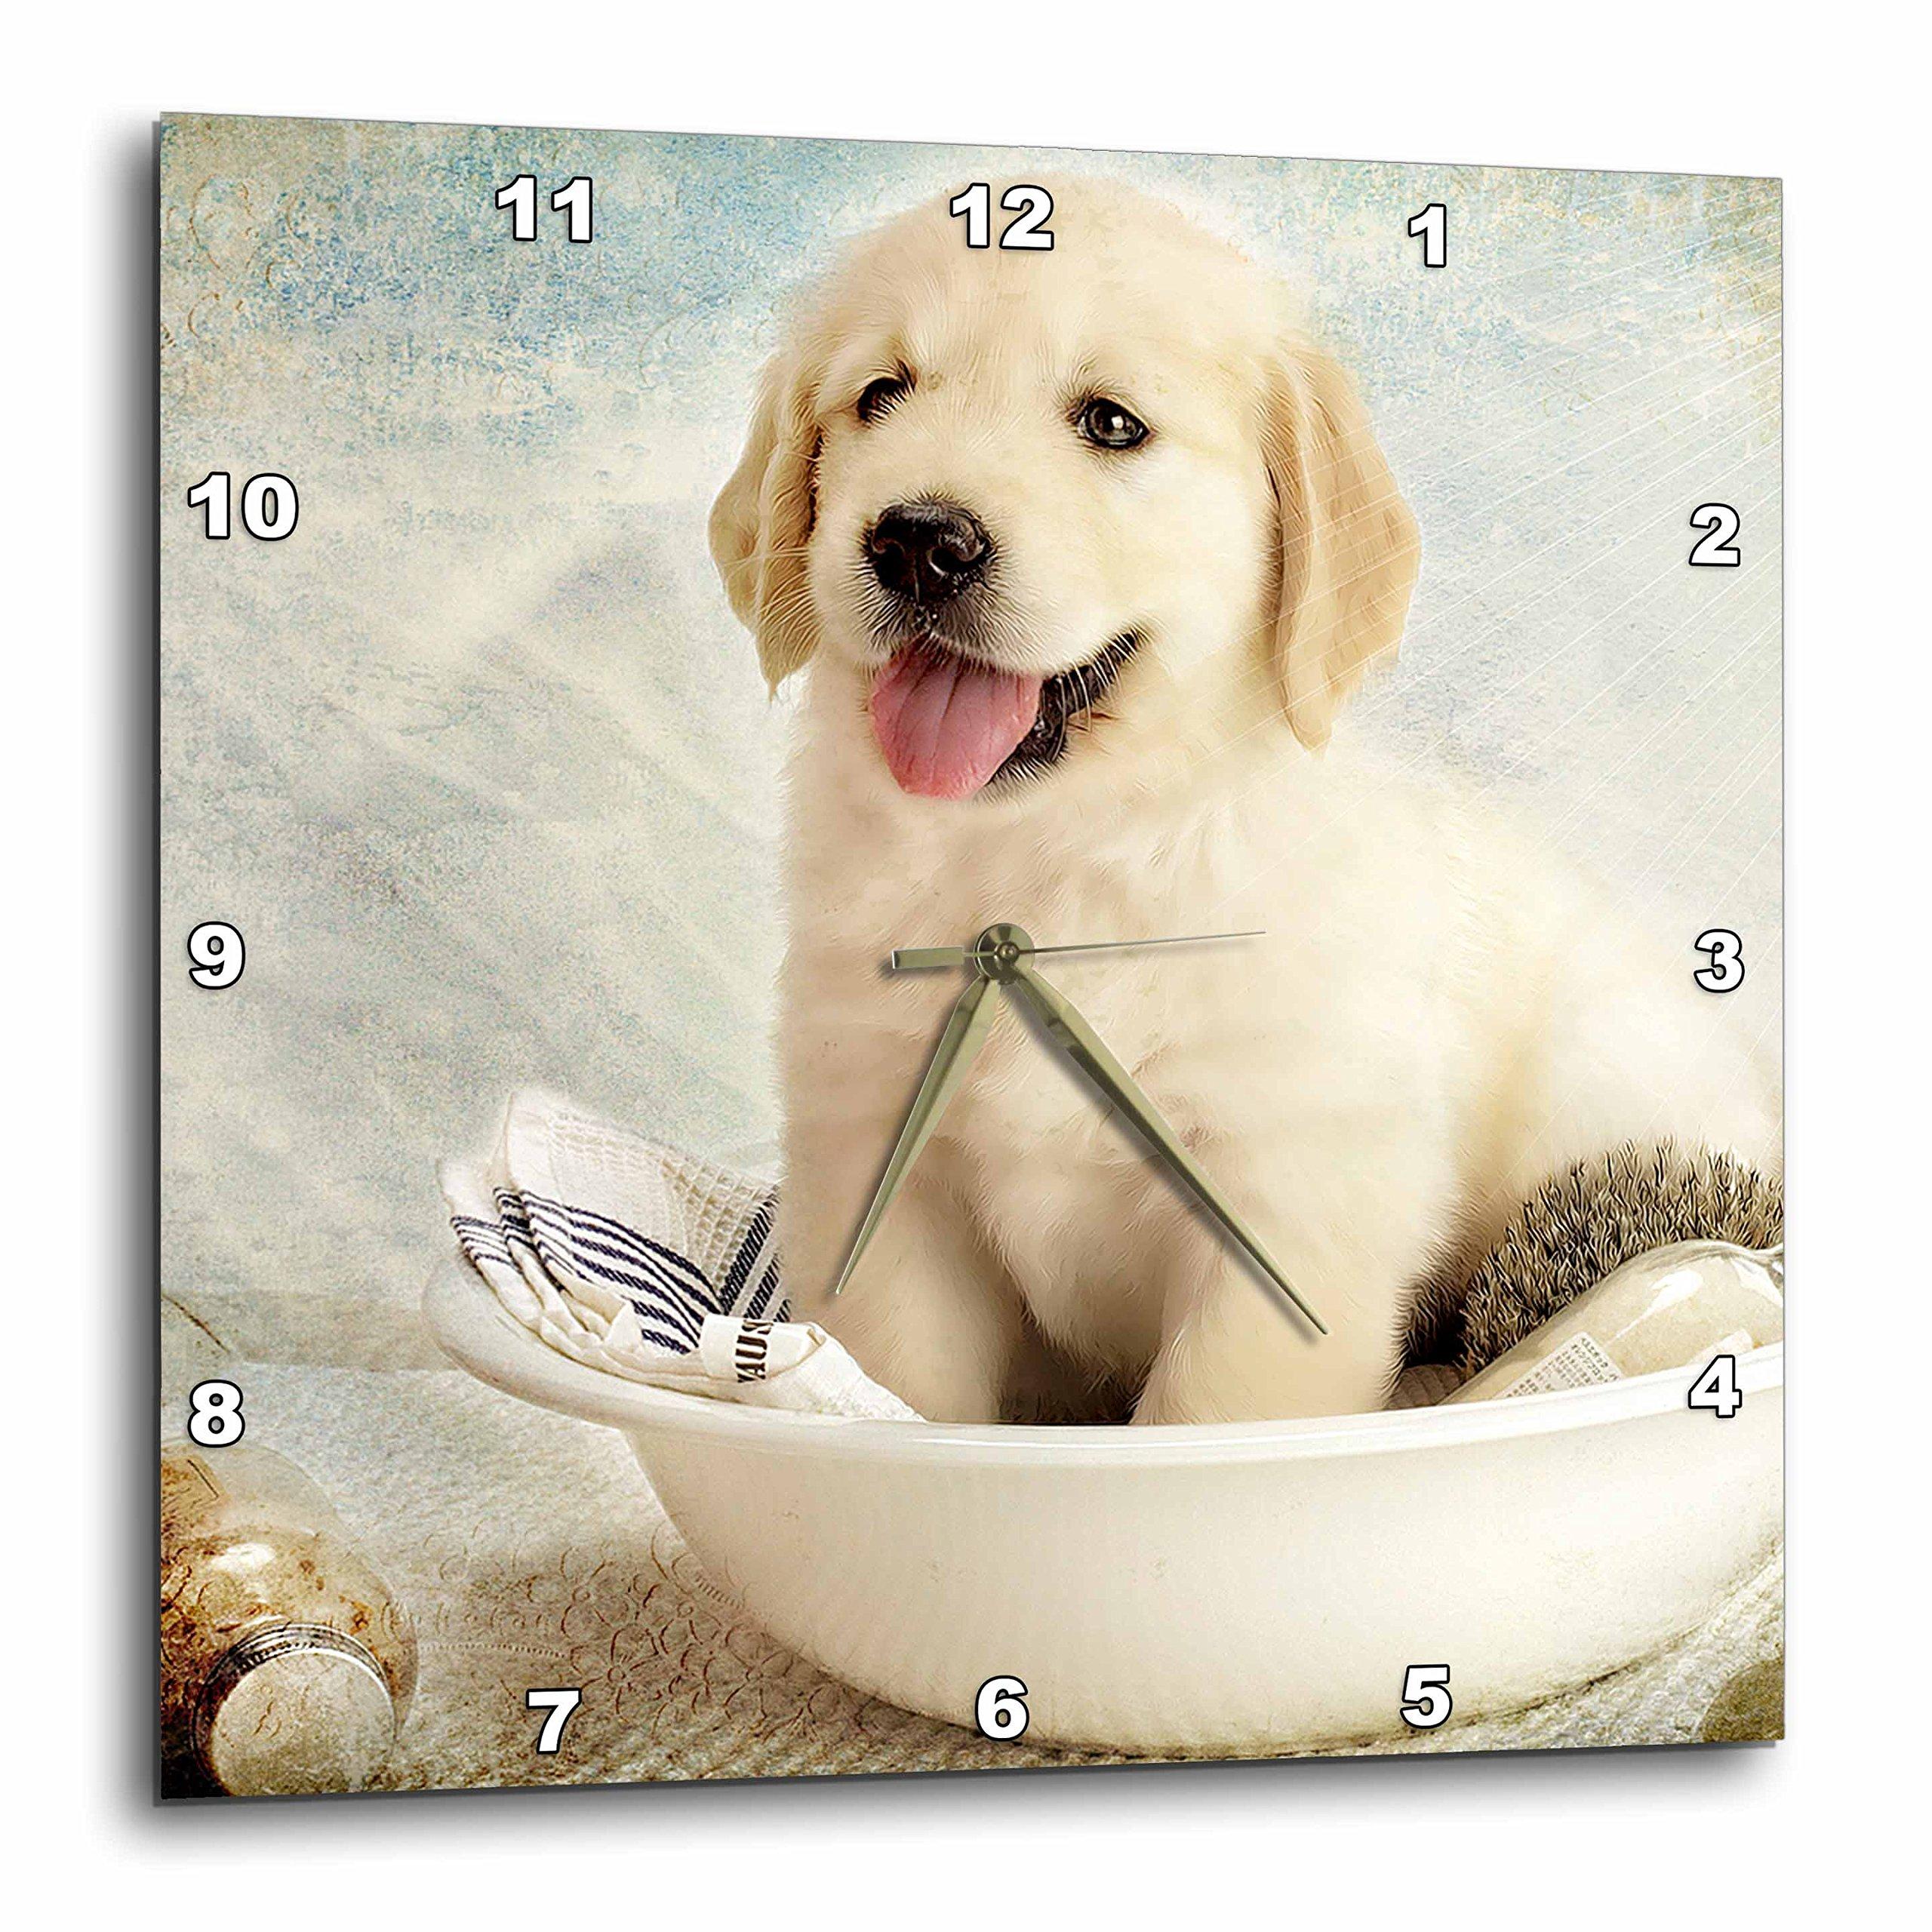 3dRose dpp_172989_3 Cute Golden Retriever Puppy Spa Day Art Photo Courtesy Badestboss. Wall Clock, 15 by 15-Inch